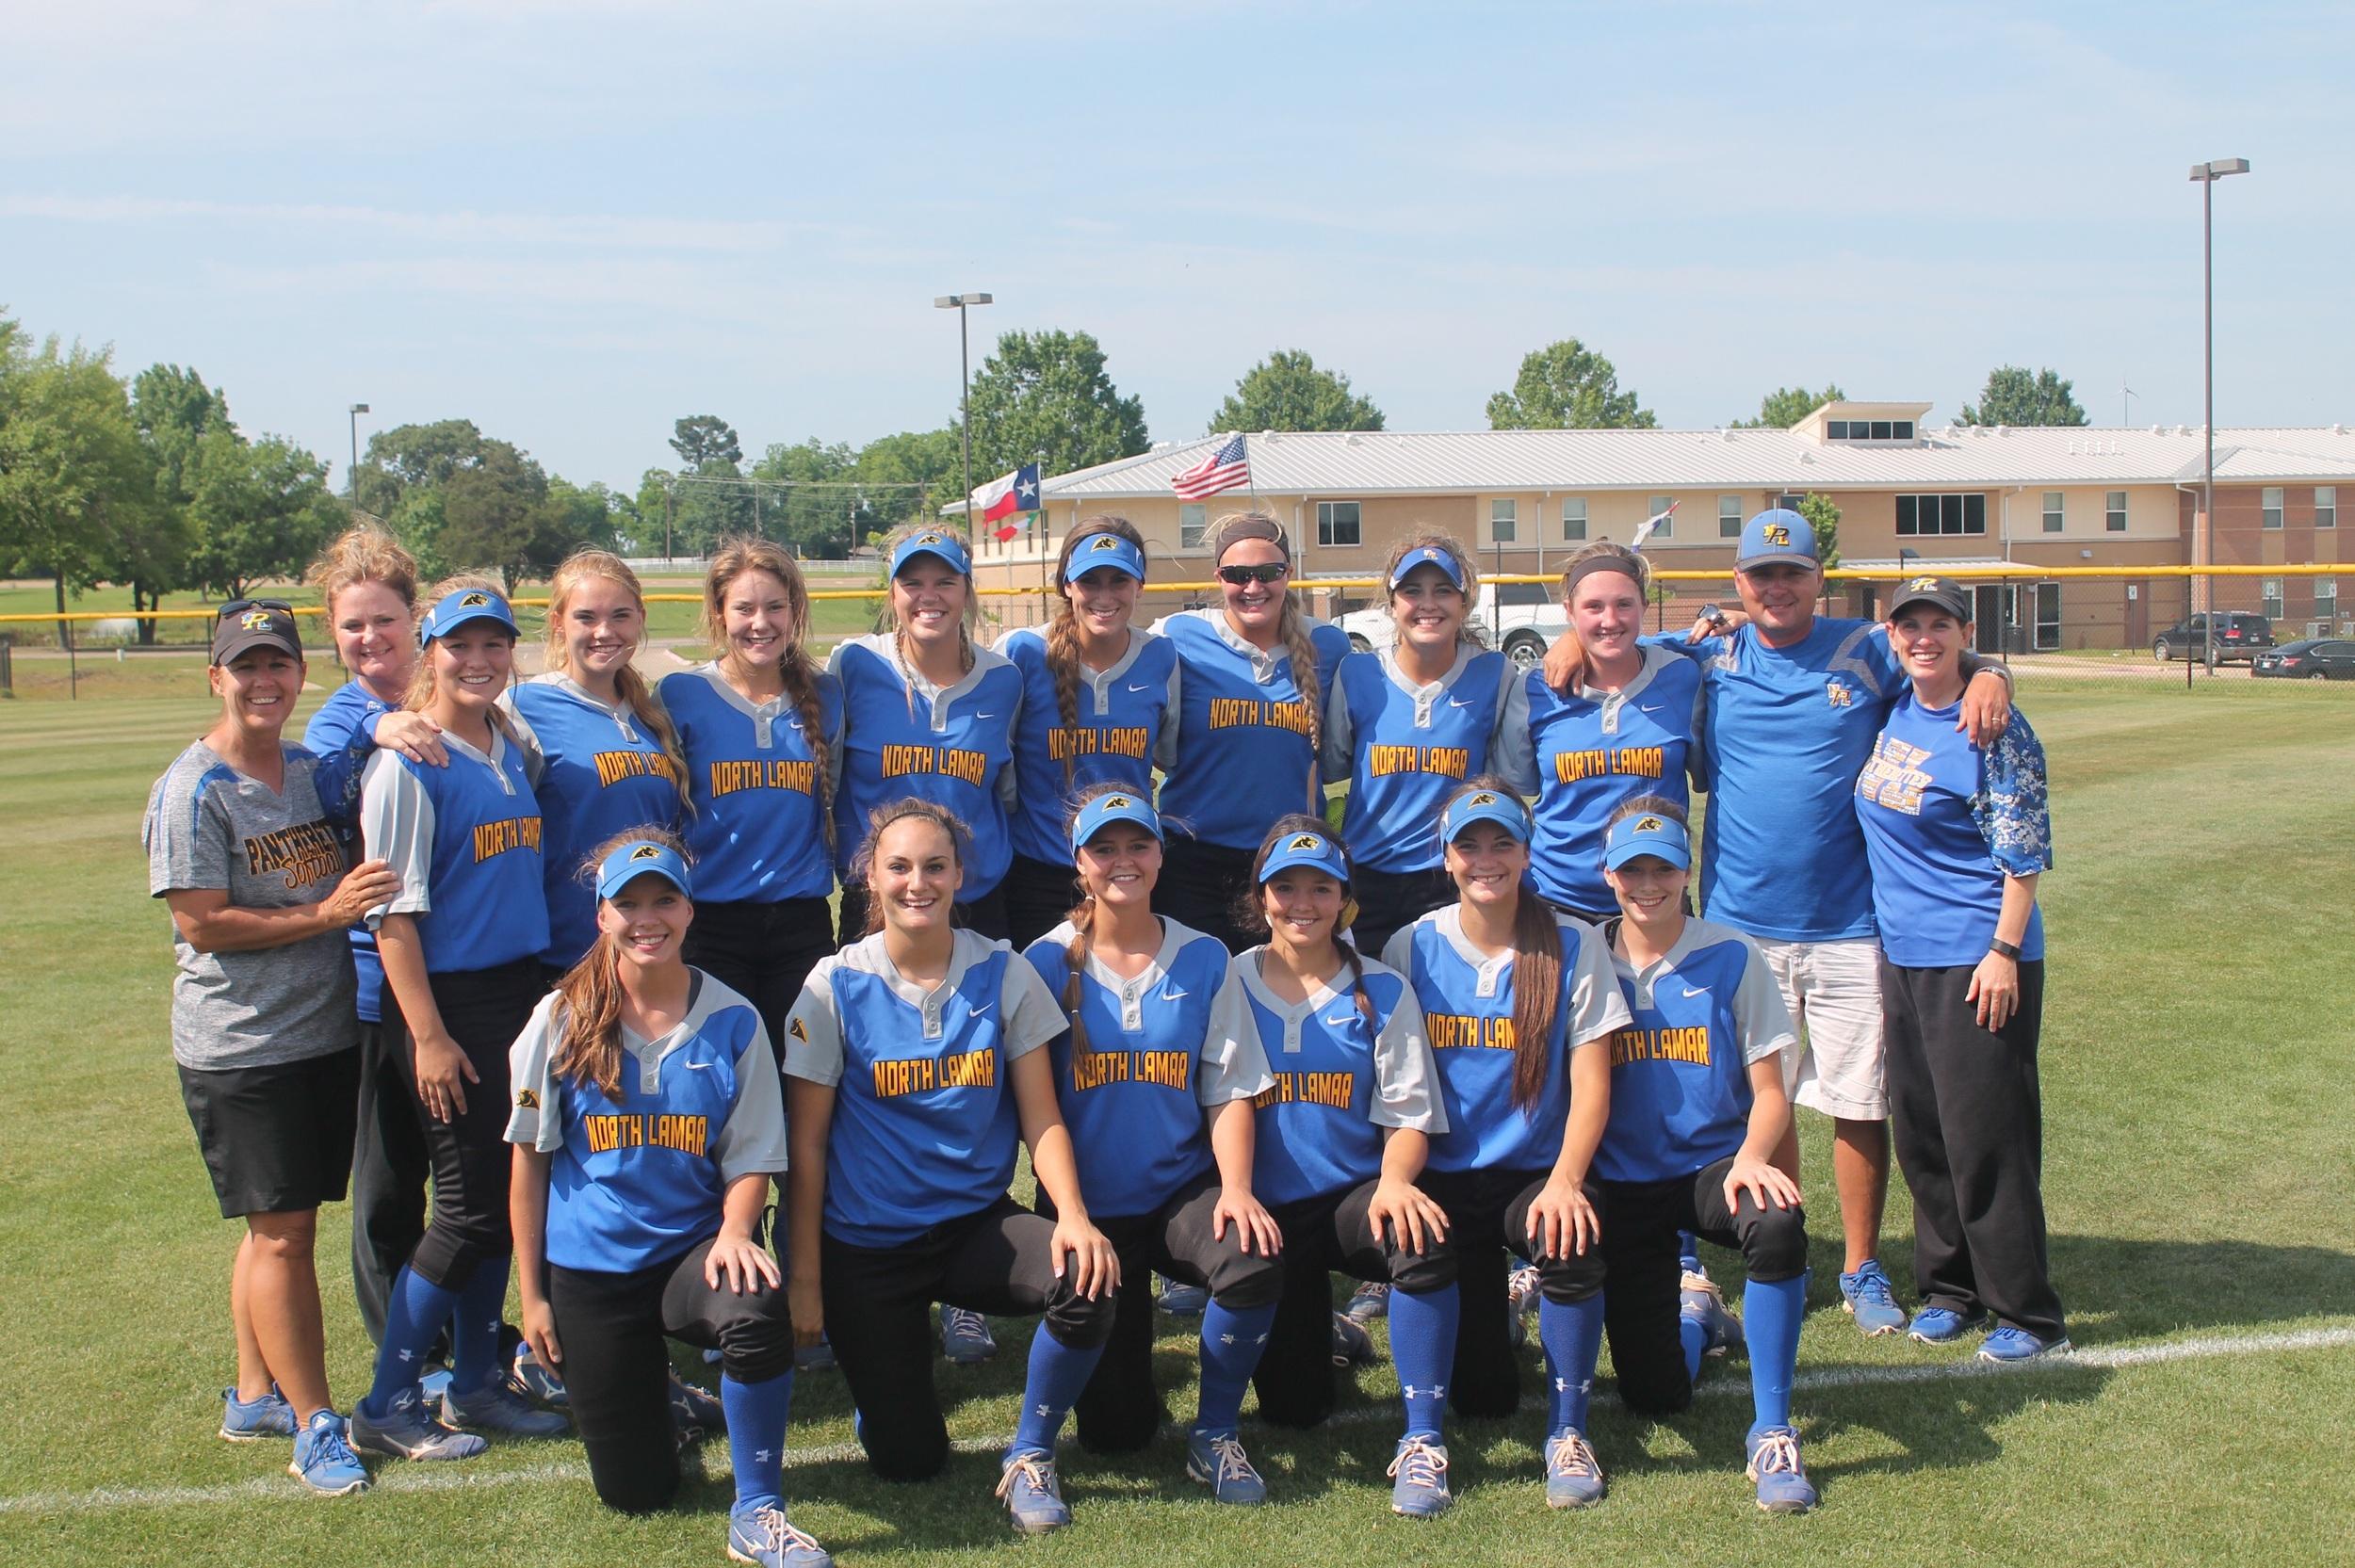 Pantherettes: Regional Quarterfinal Champions